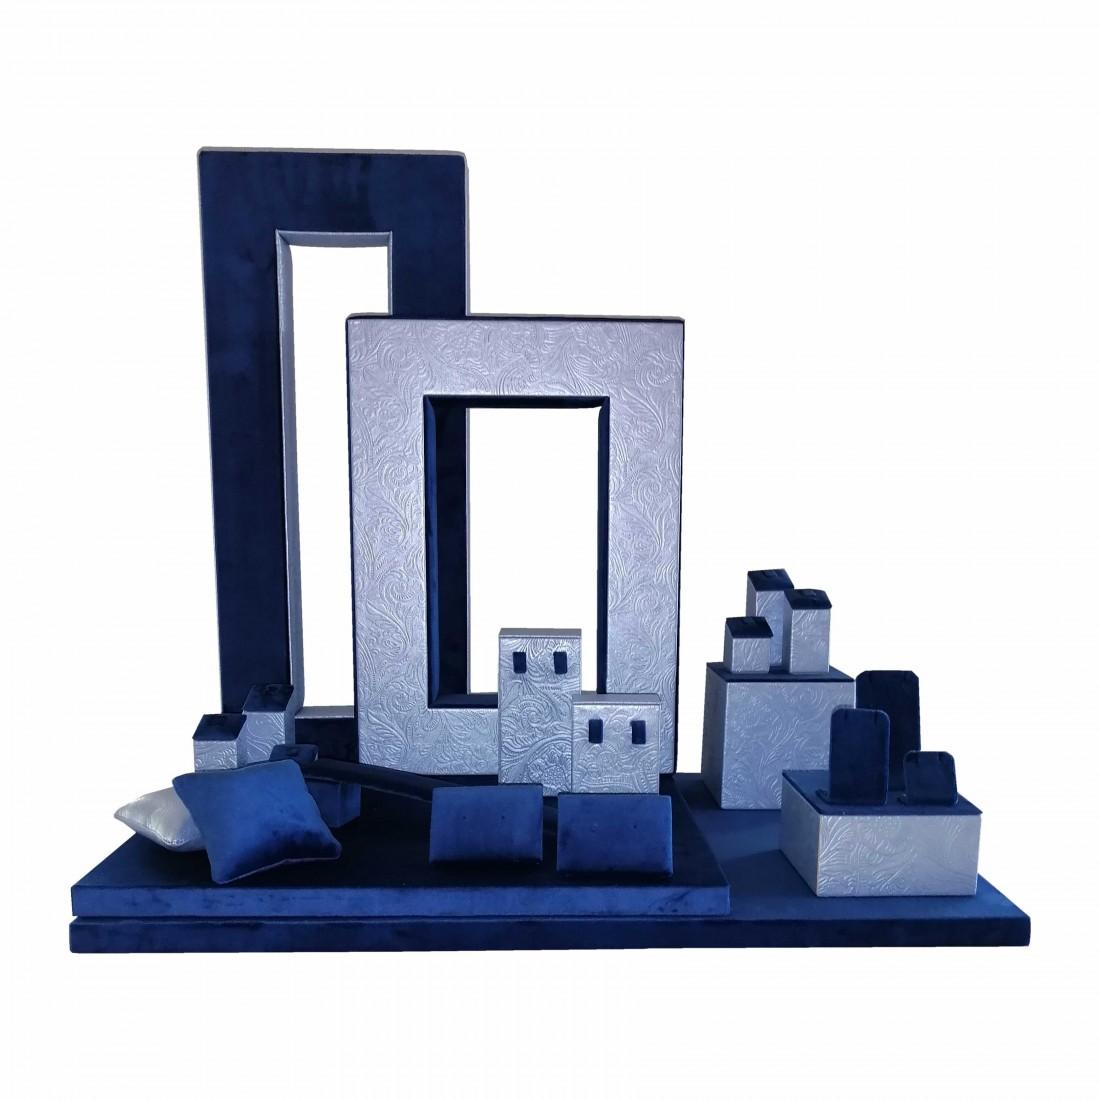 Escaparate Square (Azul)